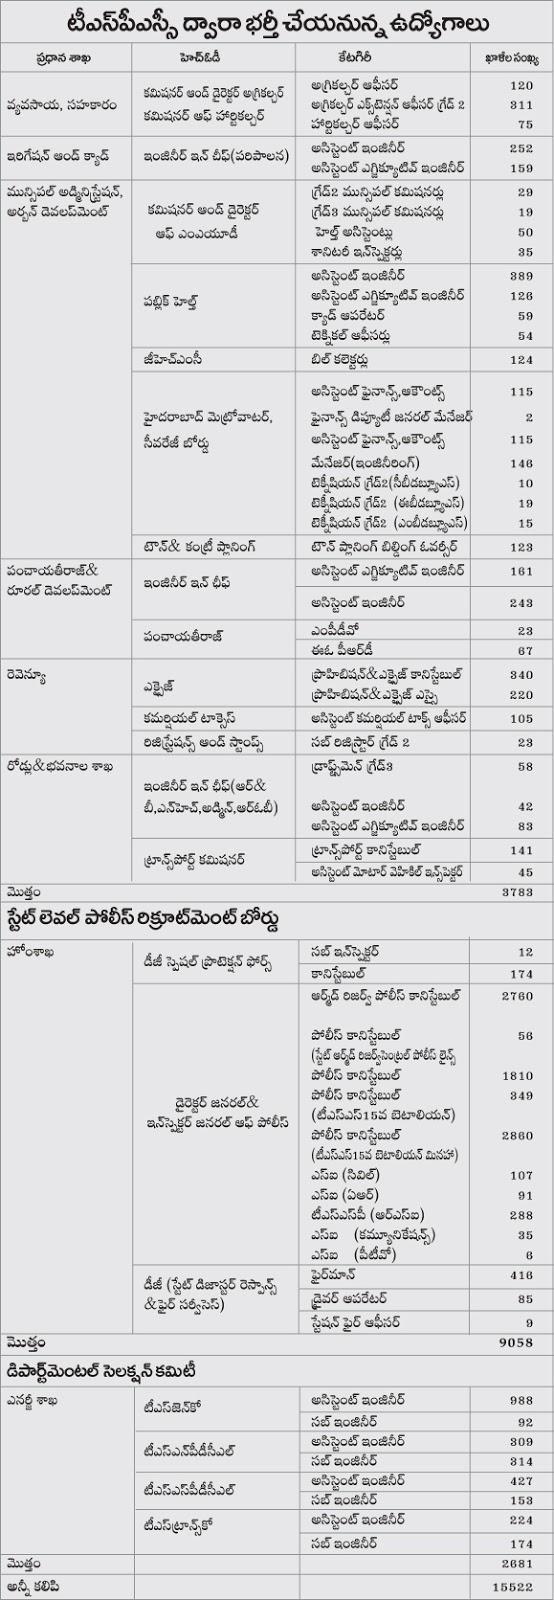 Telangana (TSPSC) 15000 Gov Jobs Notification 2017 Department Wise List & Vacancy List